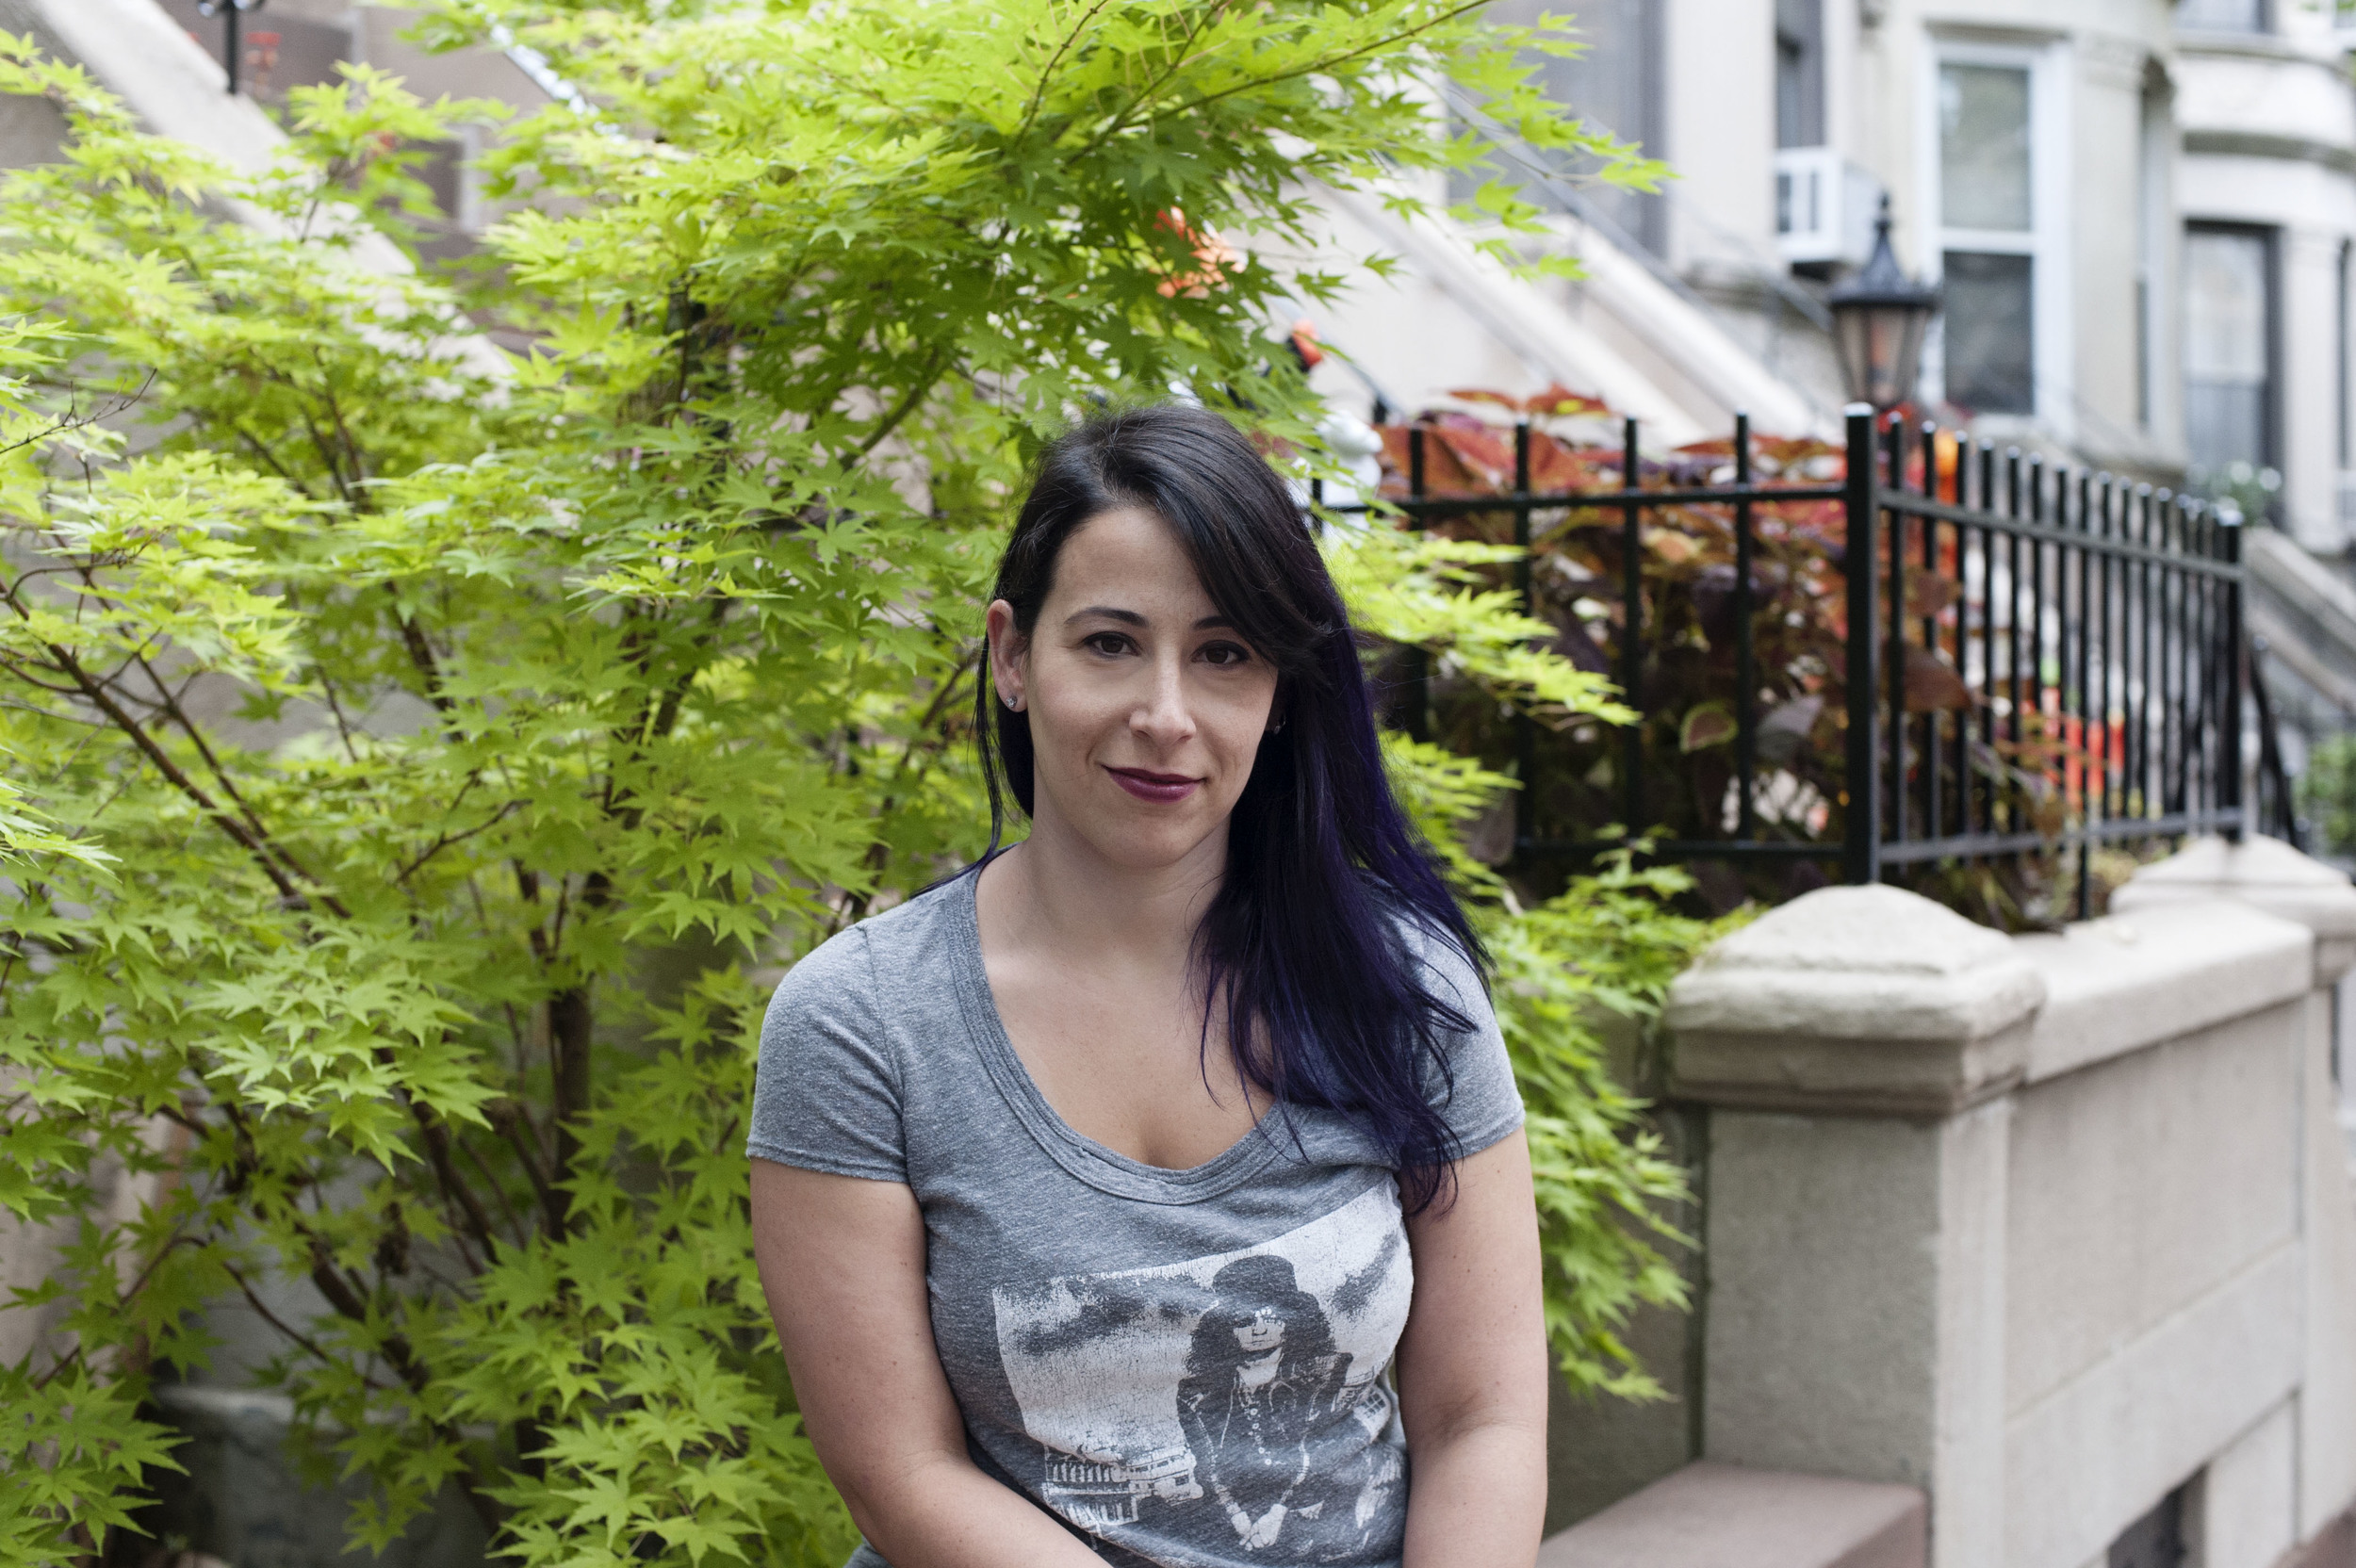 Dava Krause   Comedian, 32, Park Slope